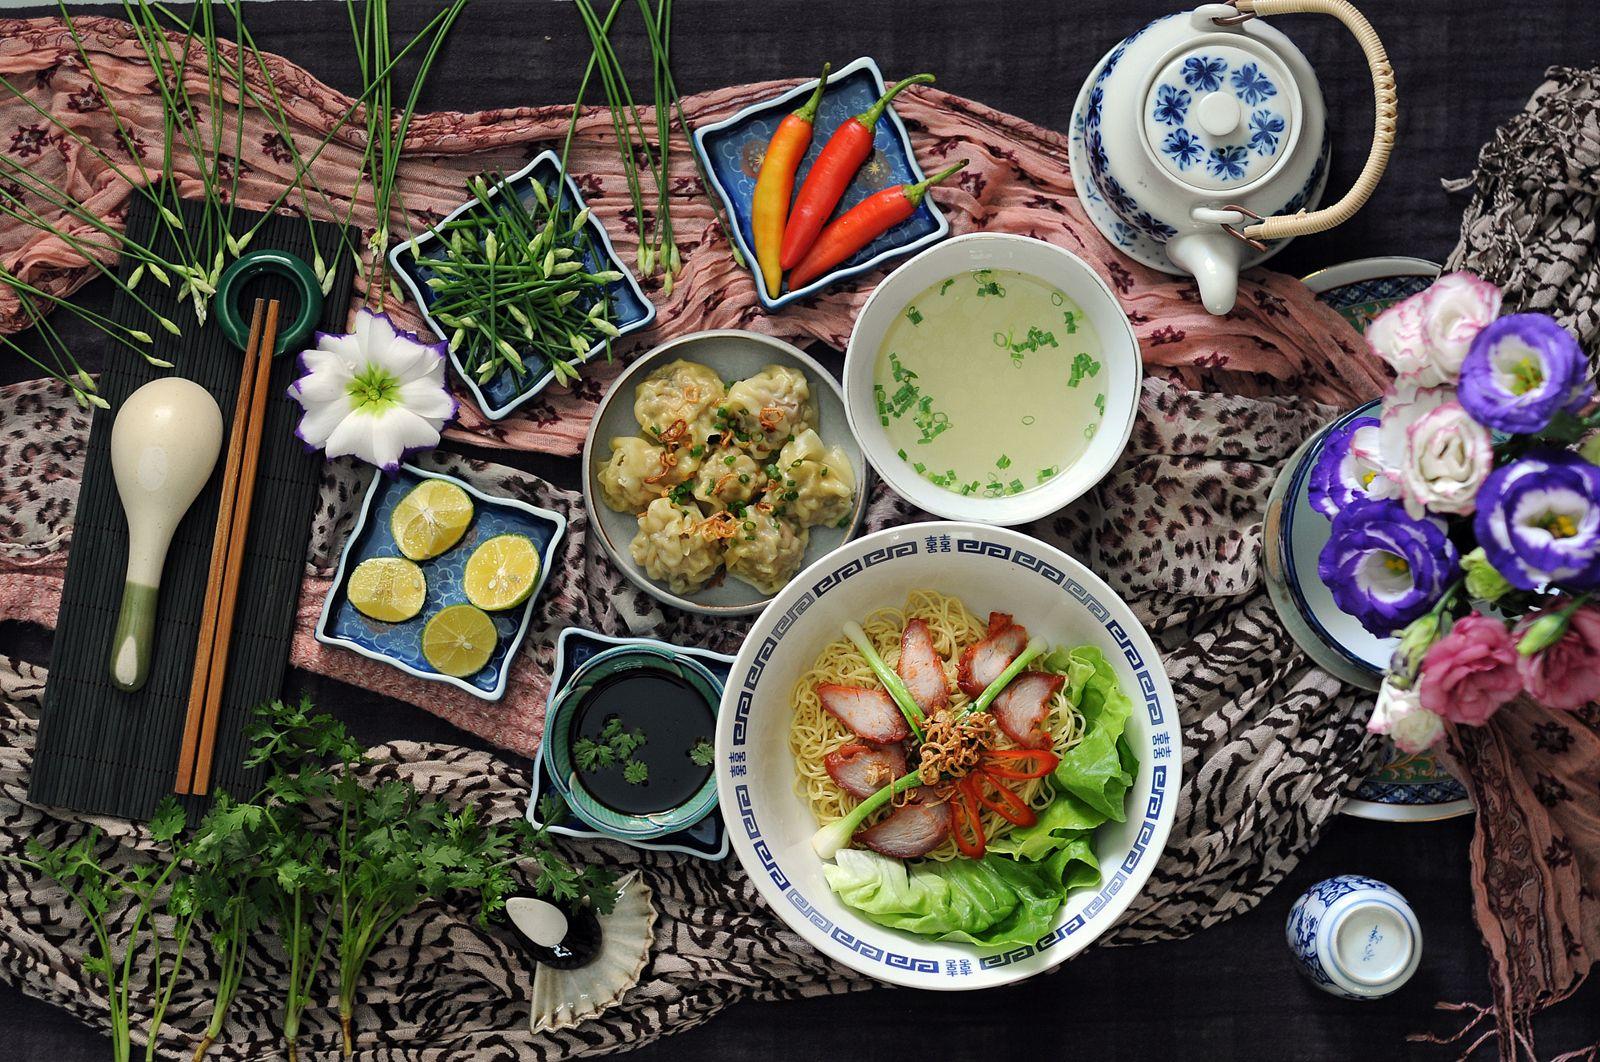 Yummy Chinese Food Wallpaper Hd Food Food Photography Food Photo